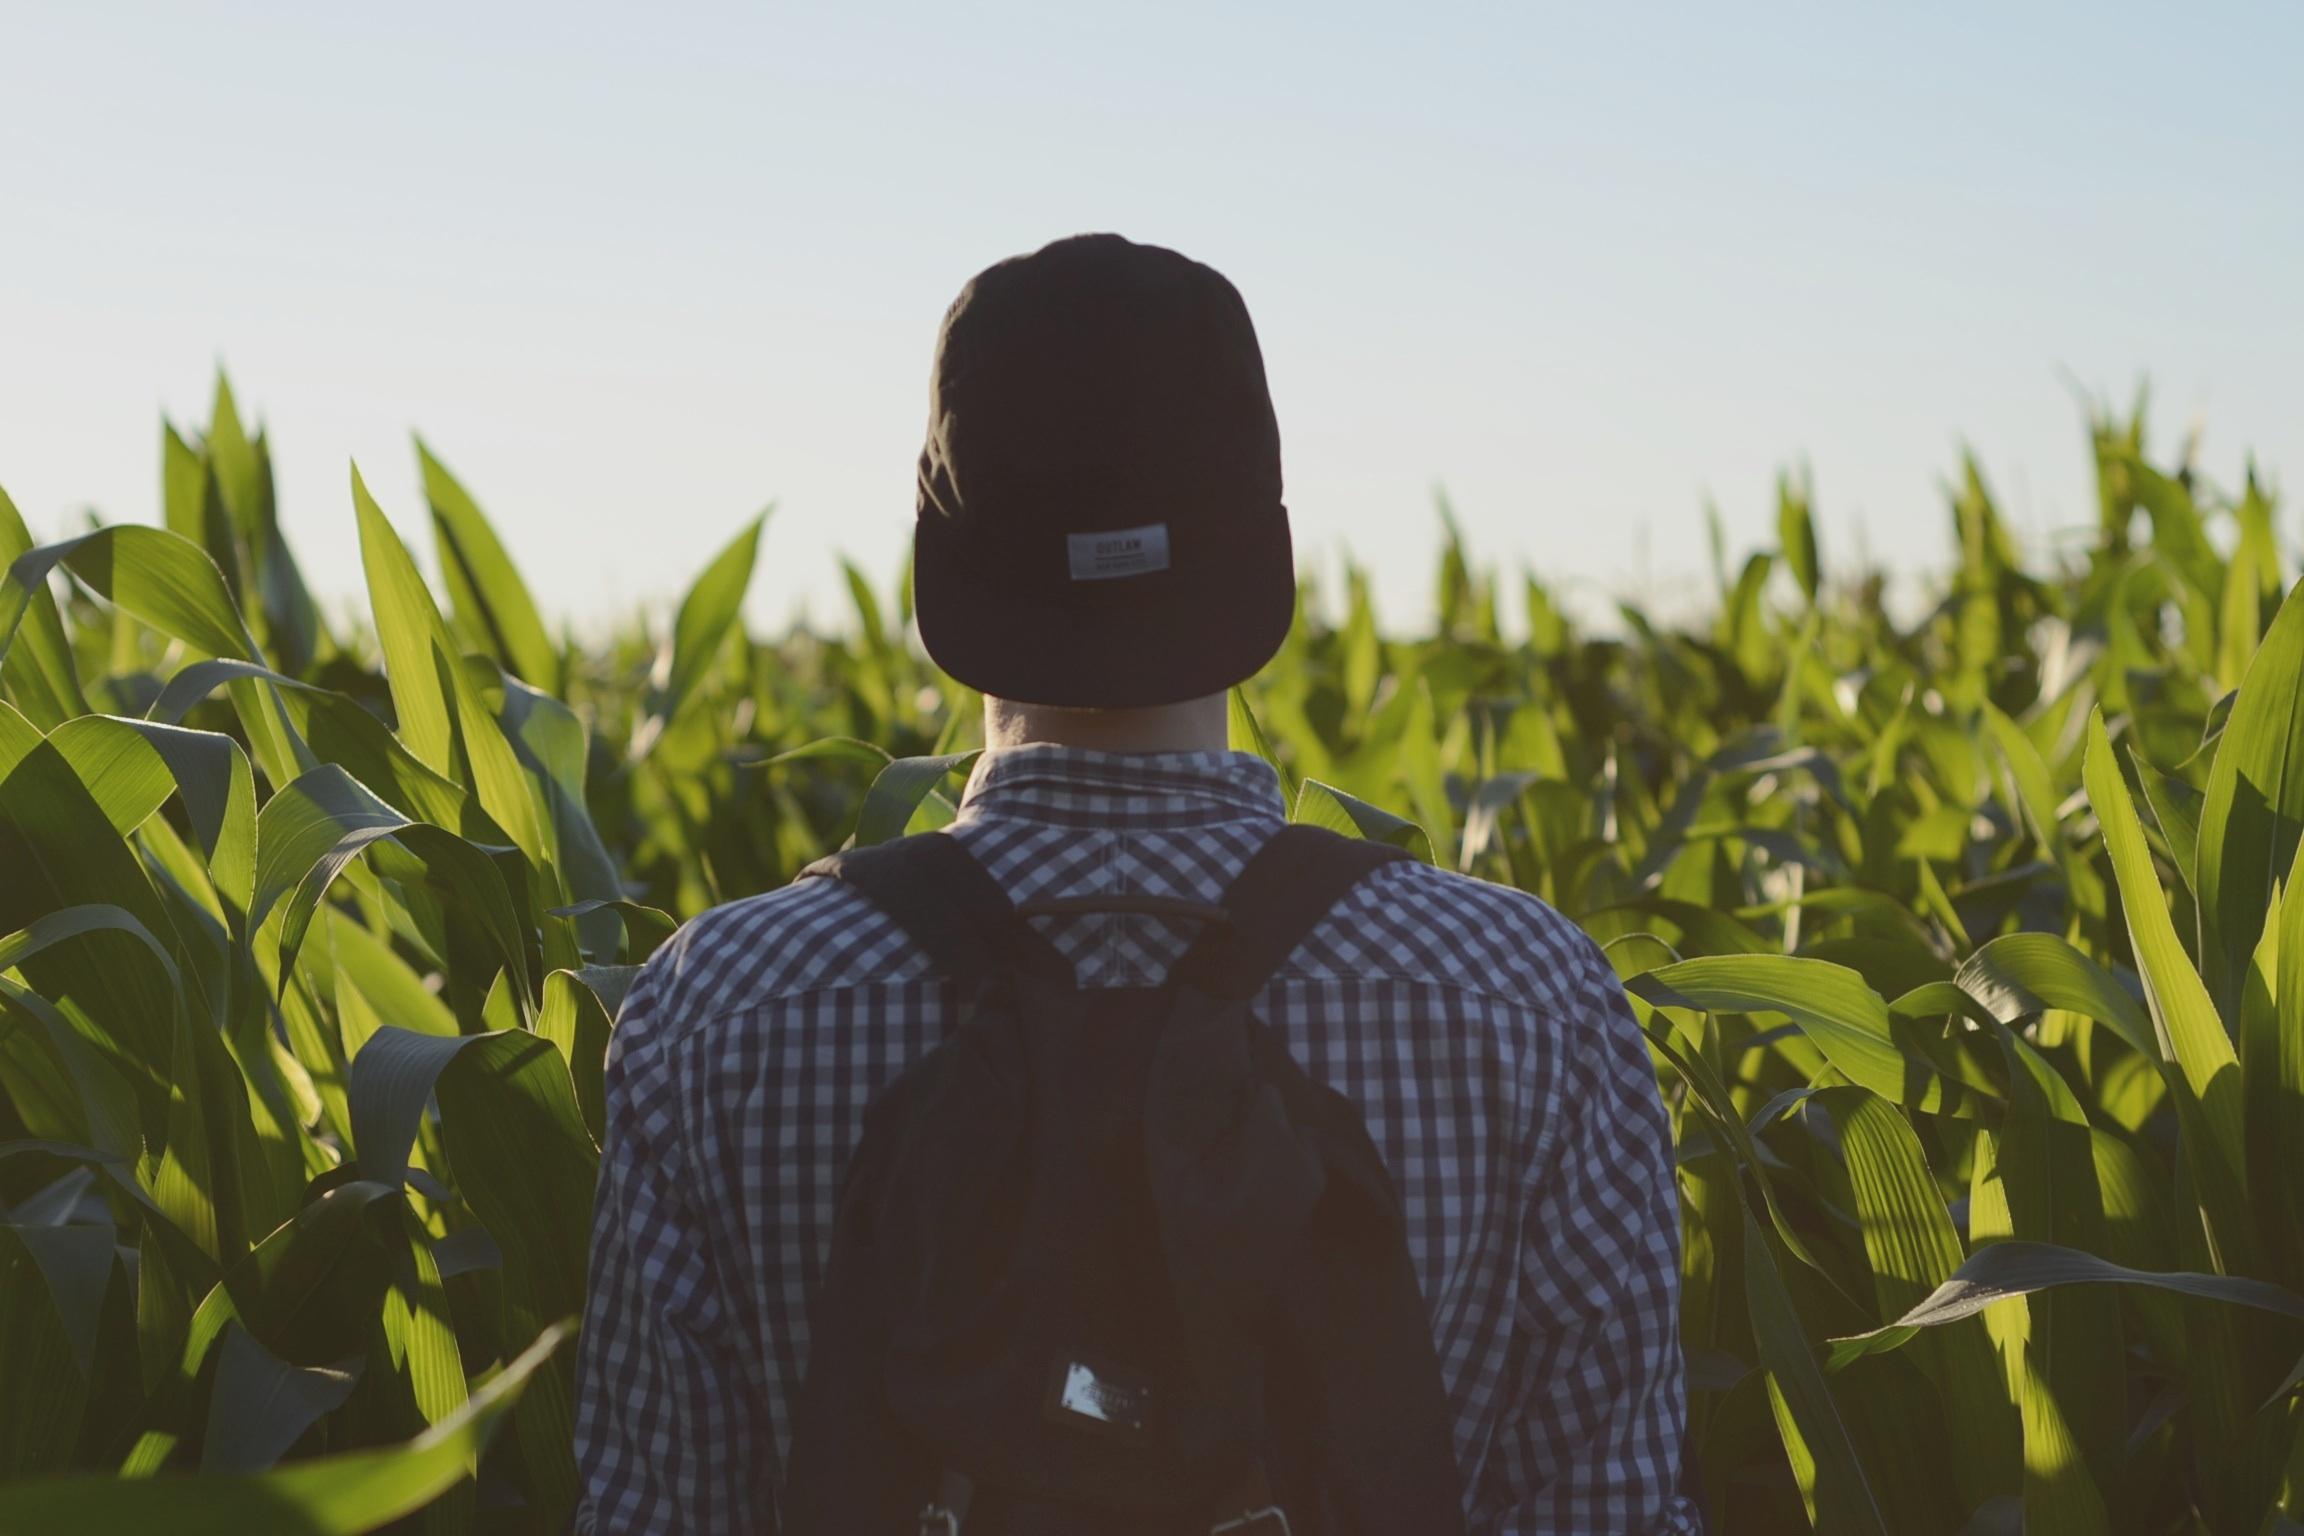 buy w back toward camera looking into corn field -sandis-helvigs